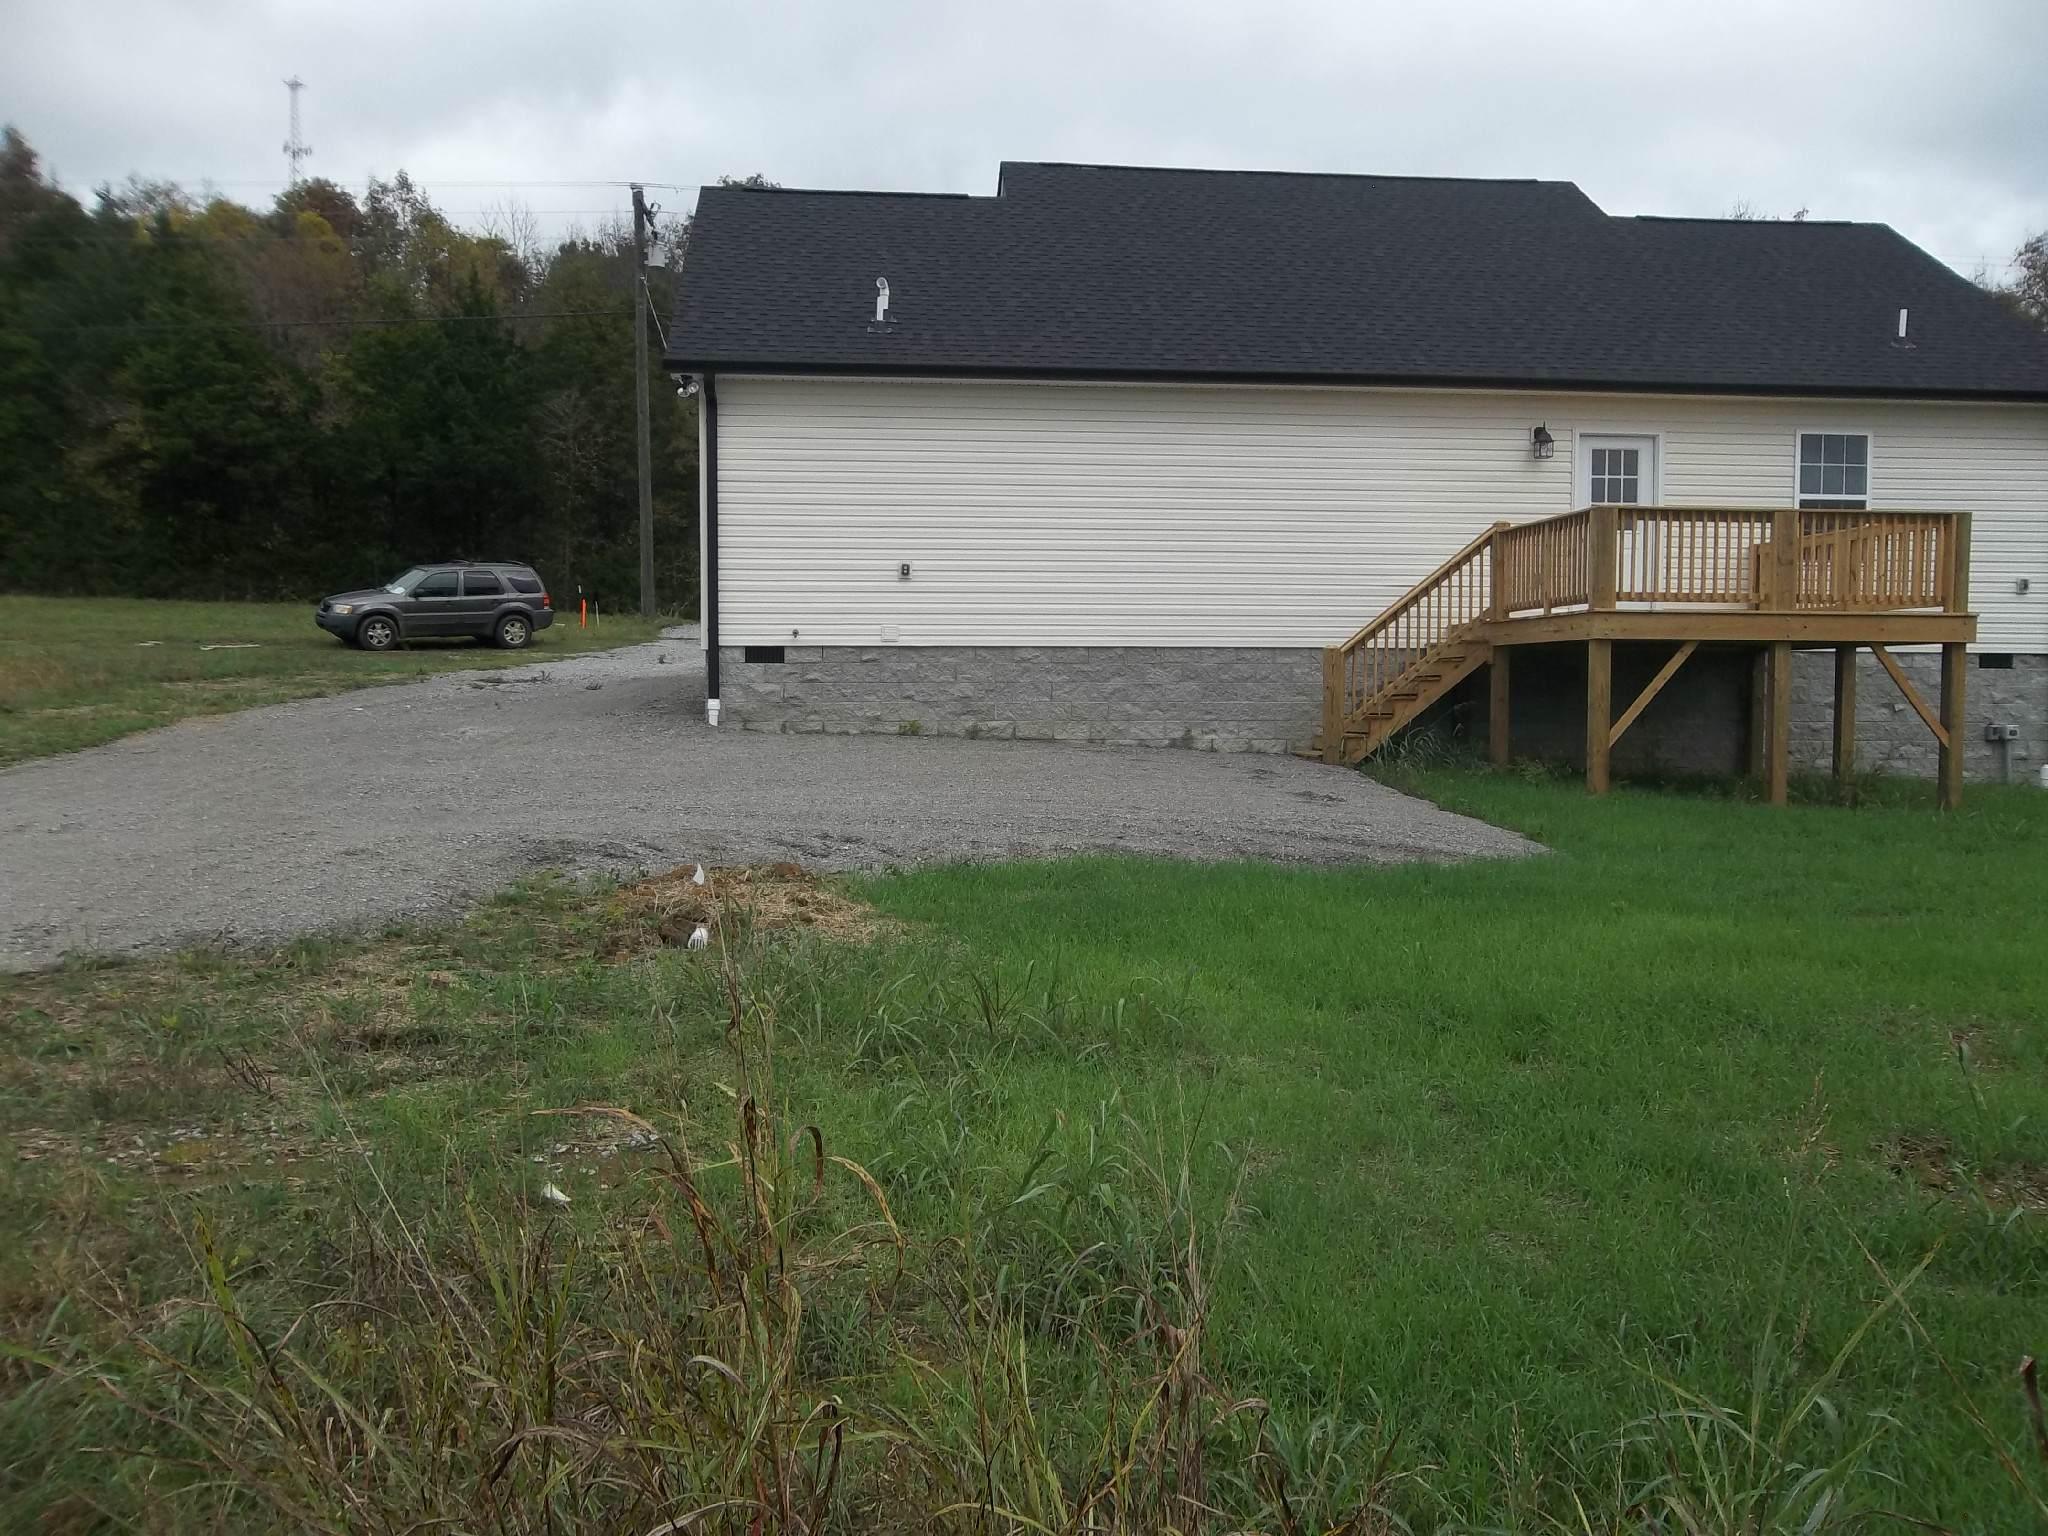 1101 Globe Rd, Lewisburg, TN 37091 (MLS #RTC2050635) :: RE/MAX Homes And Estates